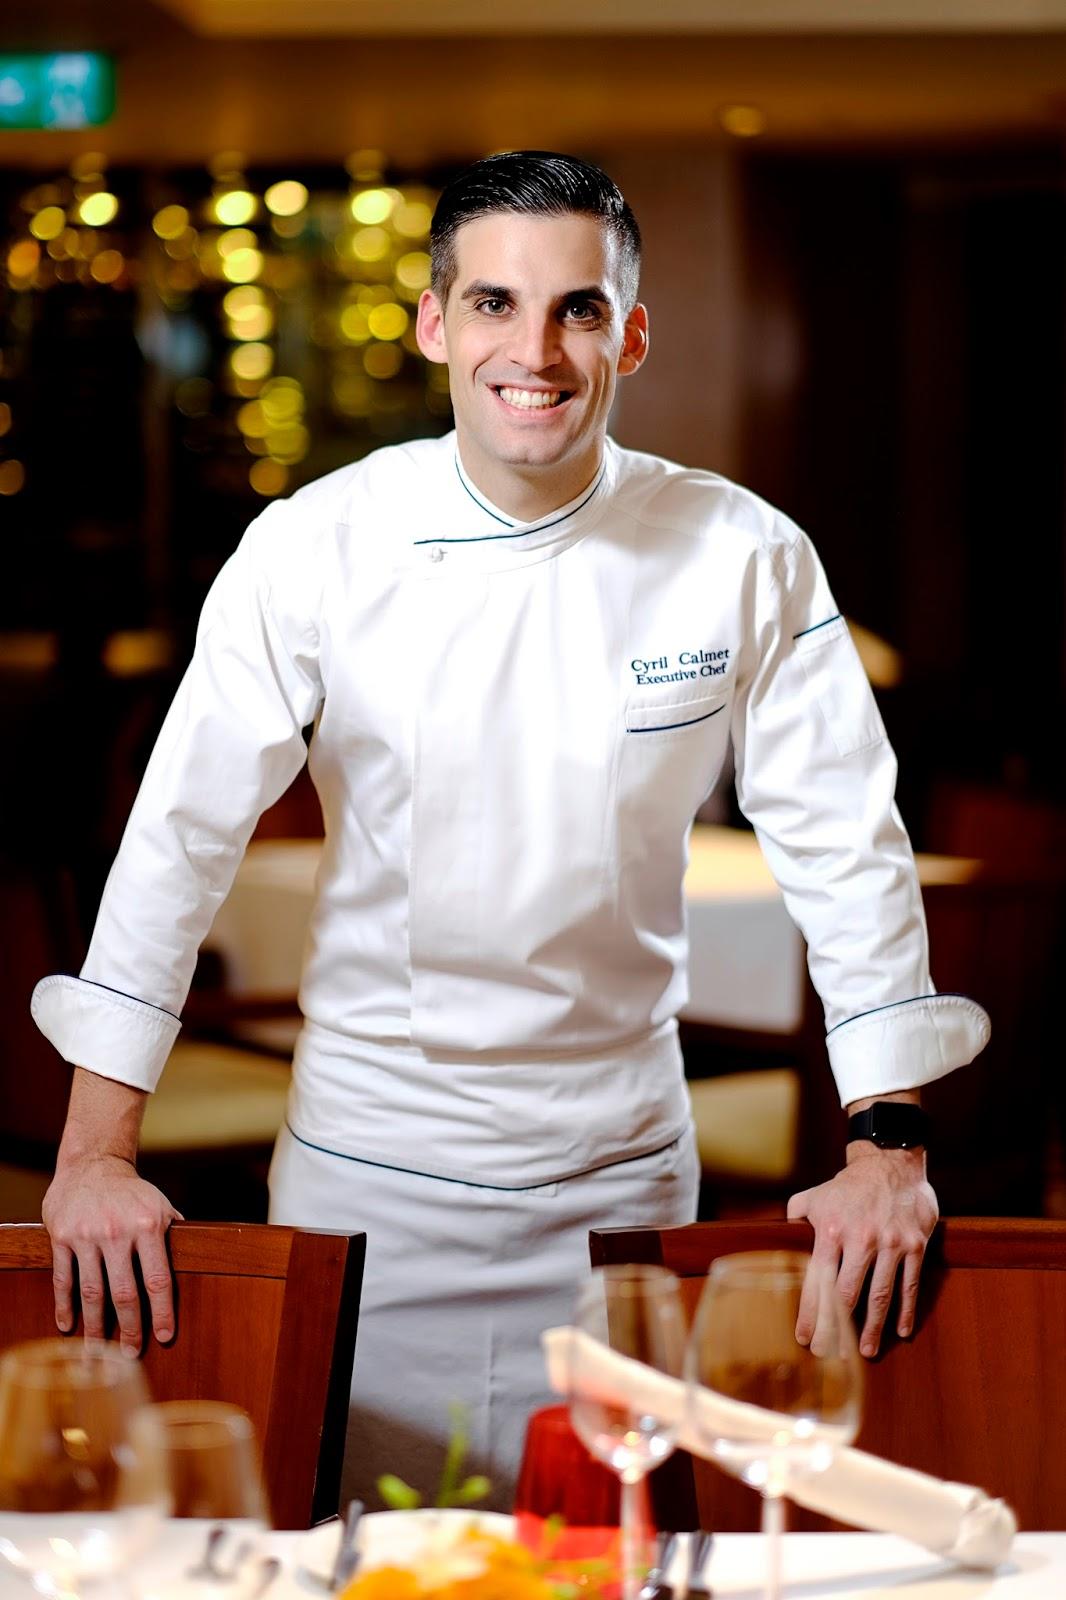 Mandarin Oriental Jakarta Executive Chef Cyril Calmet (www.culinarybonanza.com)